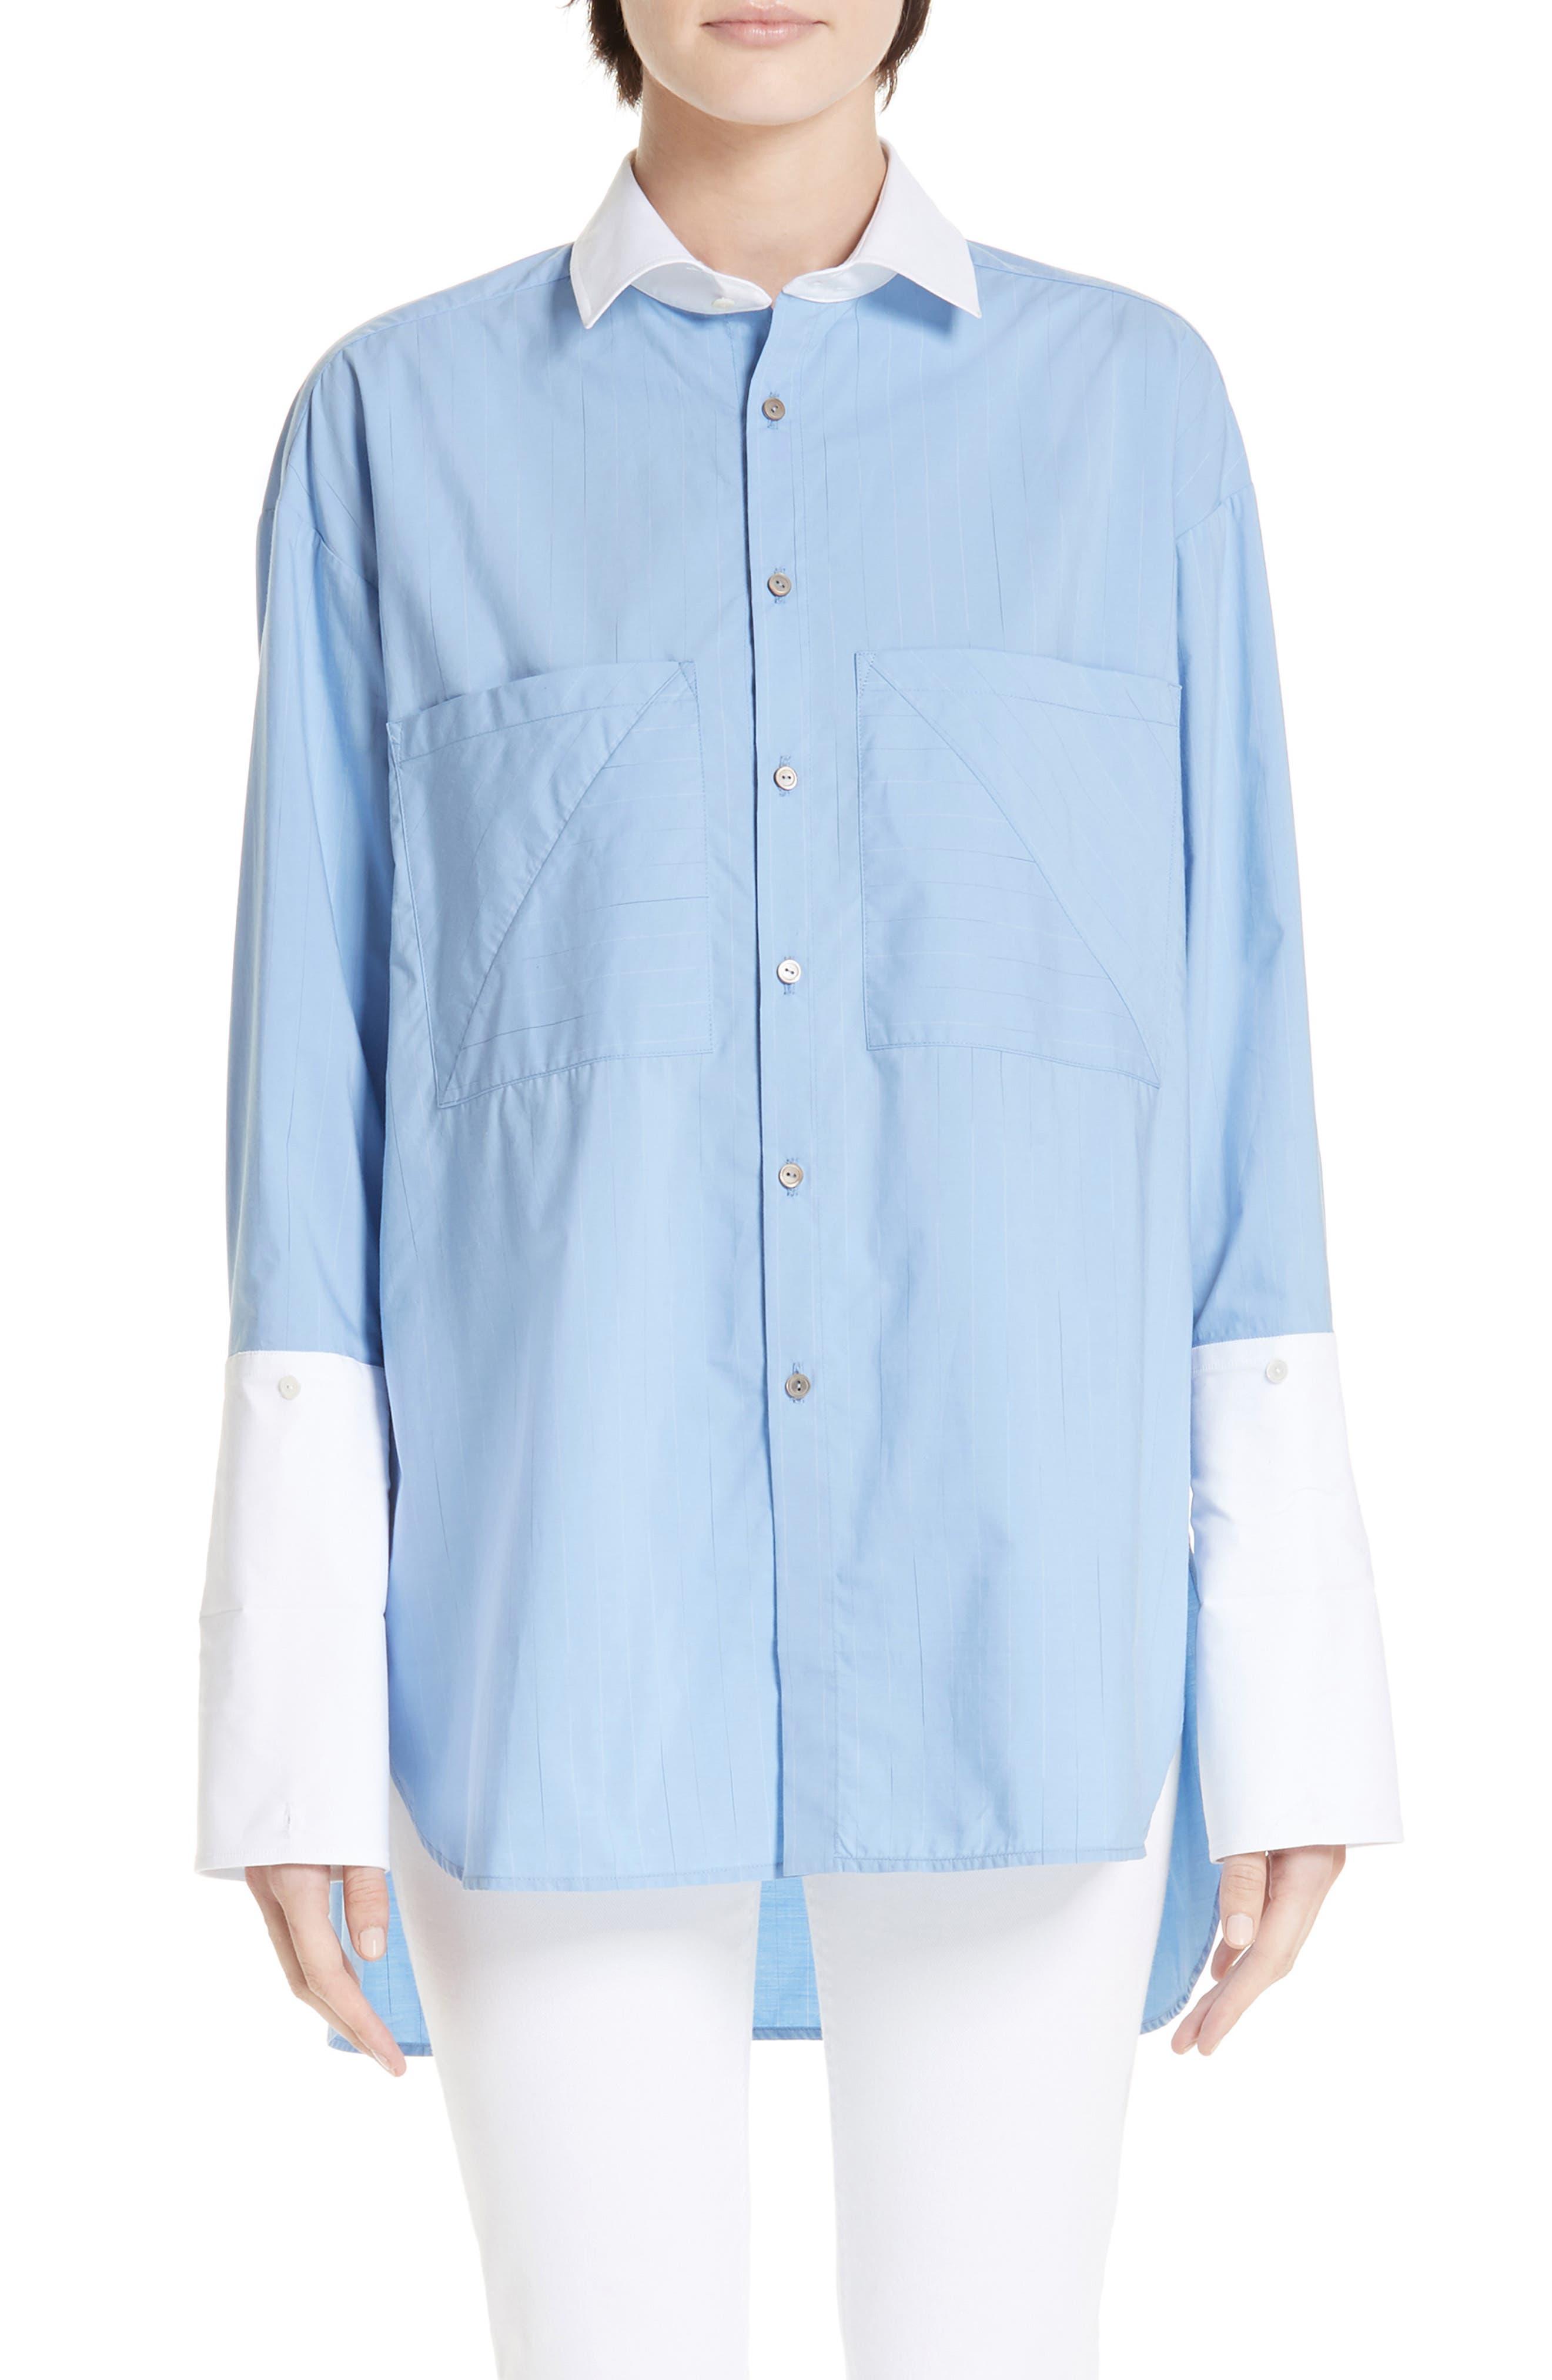 Oversize Boyfriend Shirt, Main, color, BLUE RAIN STRIPE WITH WHITE